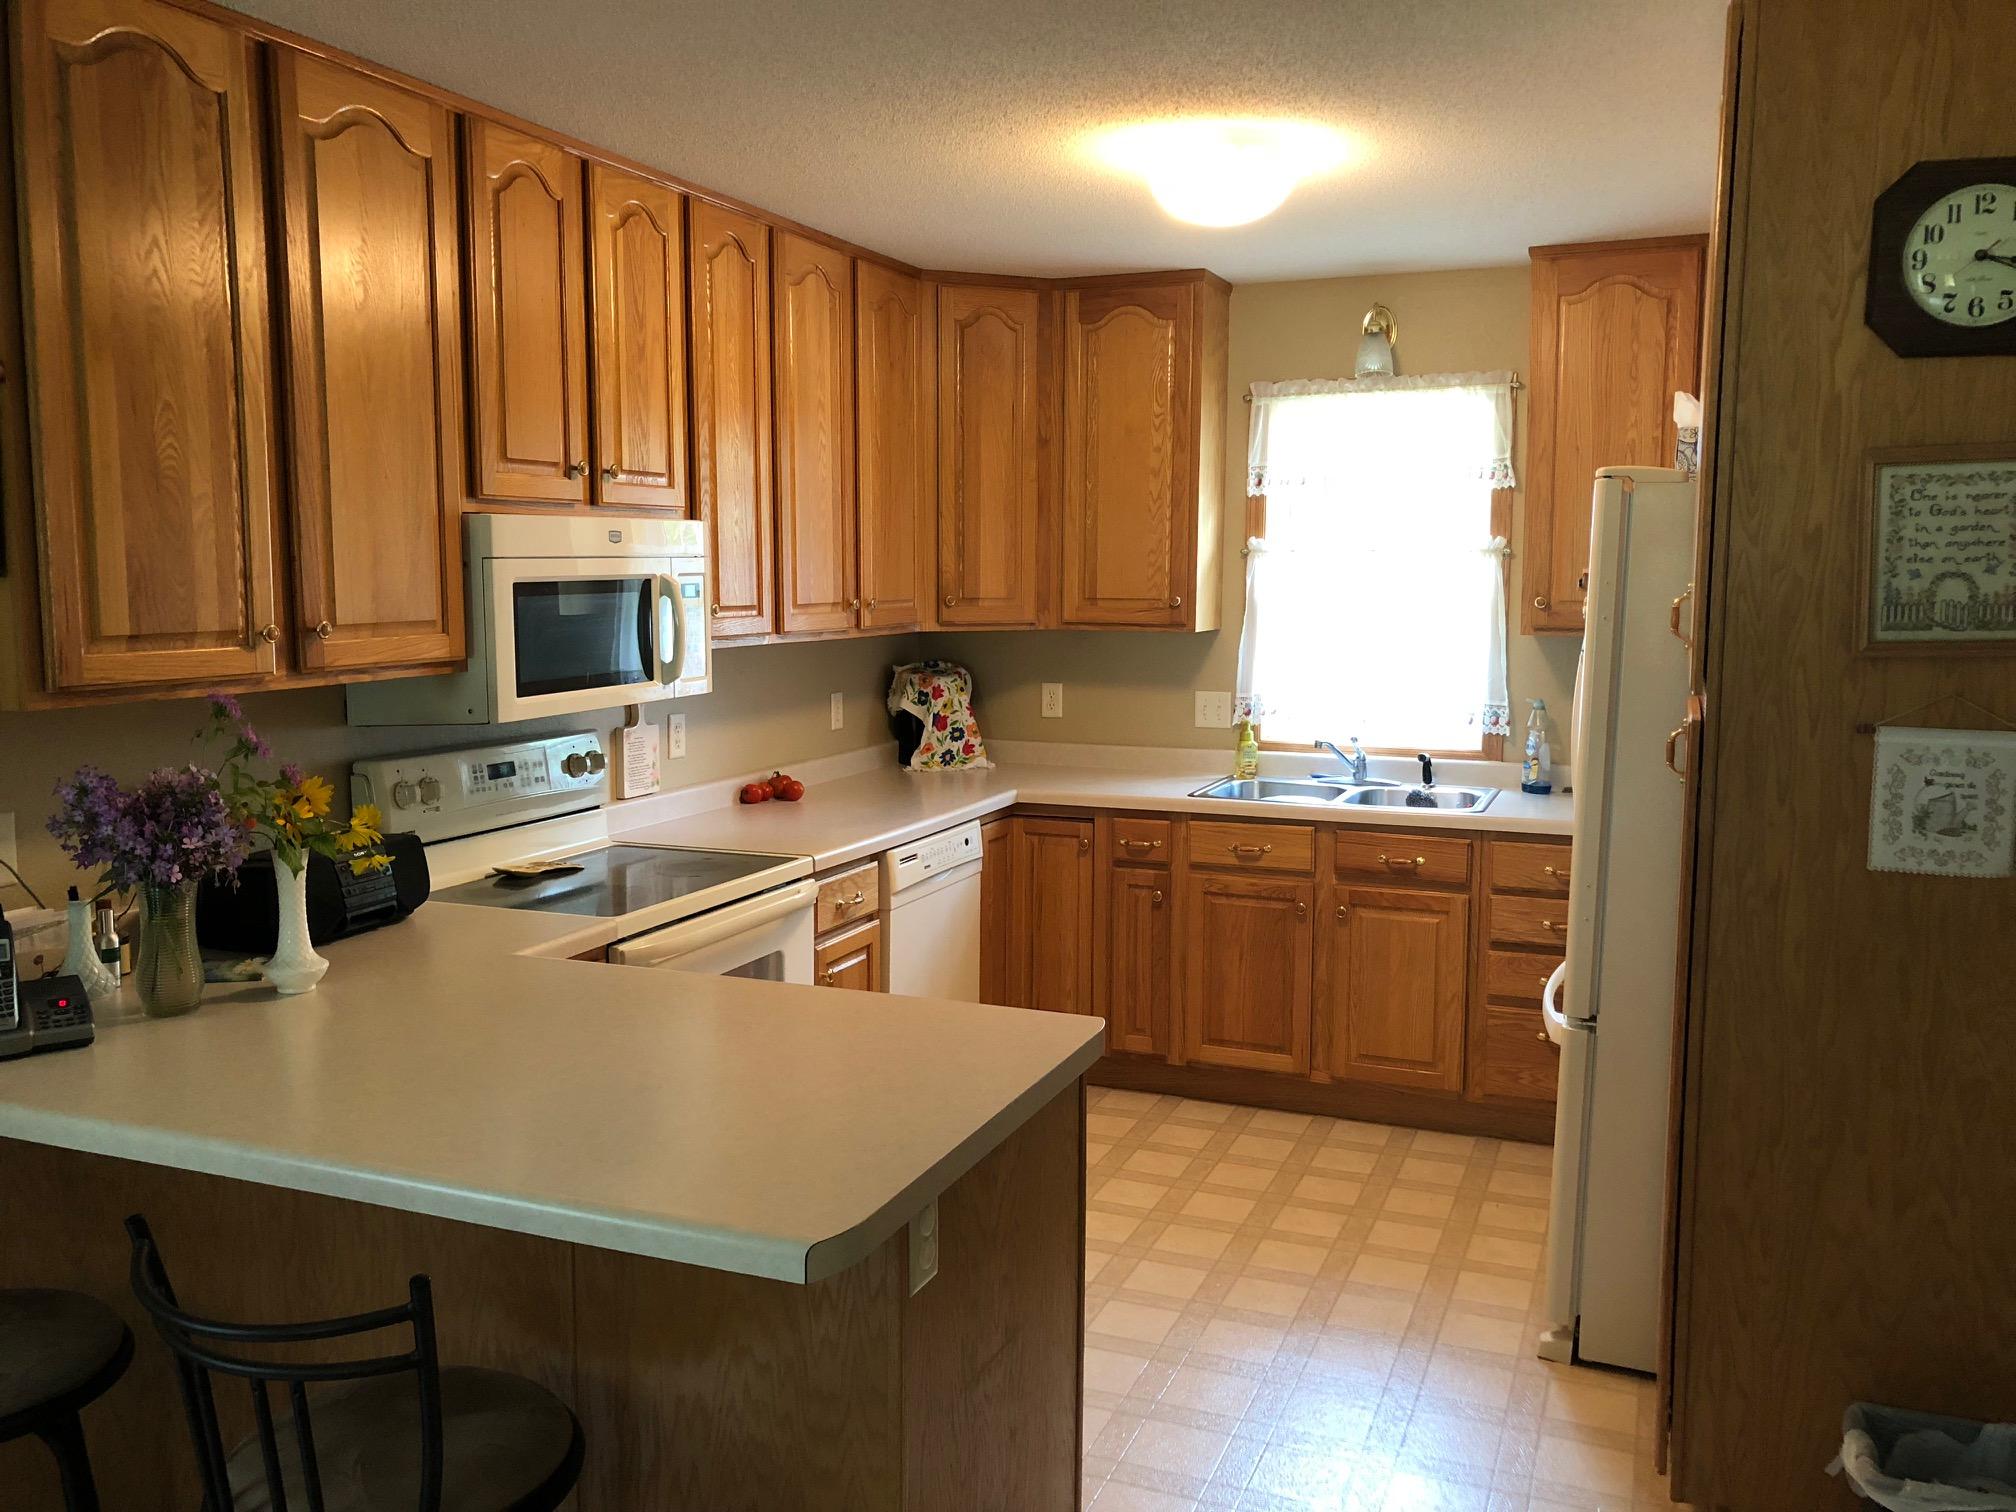 720 Erin St, Green Isle, MN 55338 | RealEstate.com